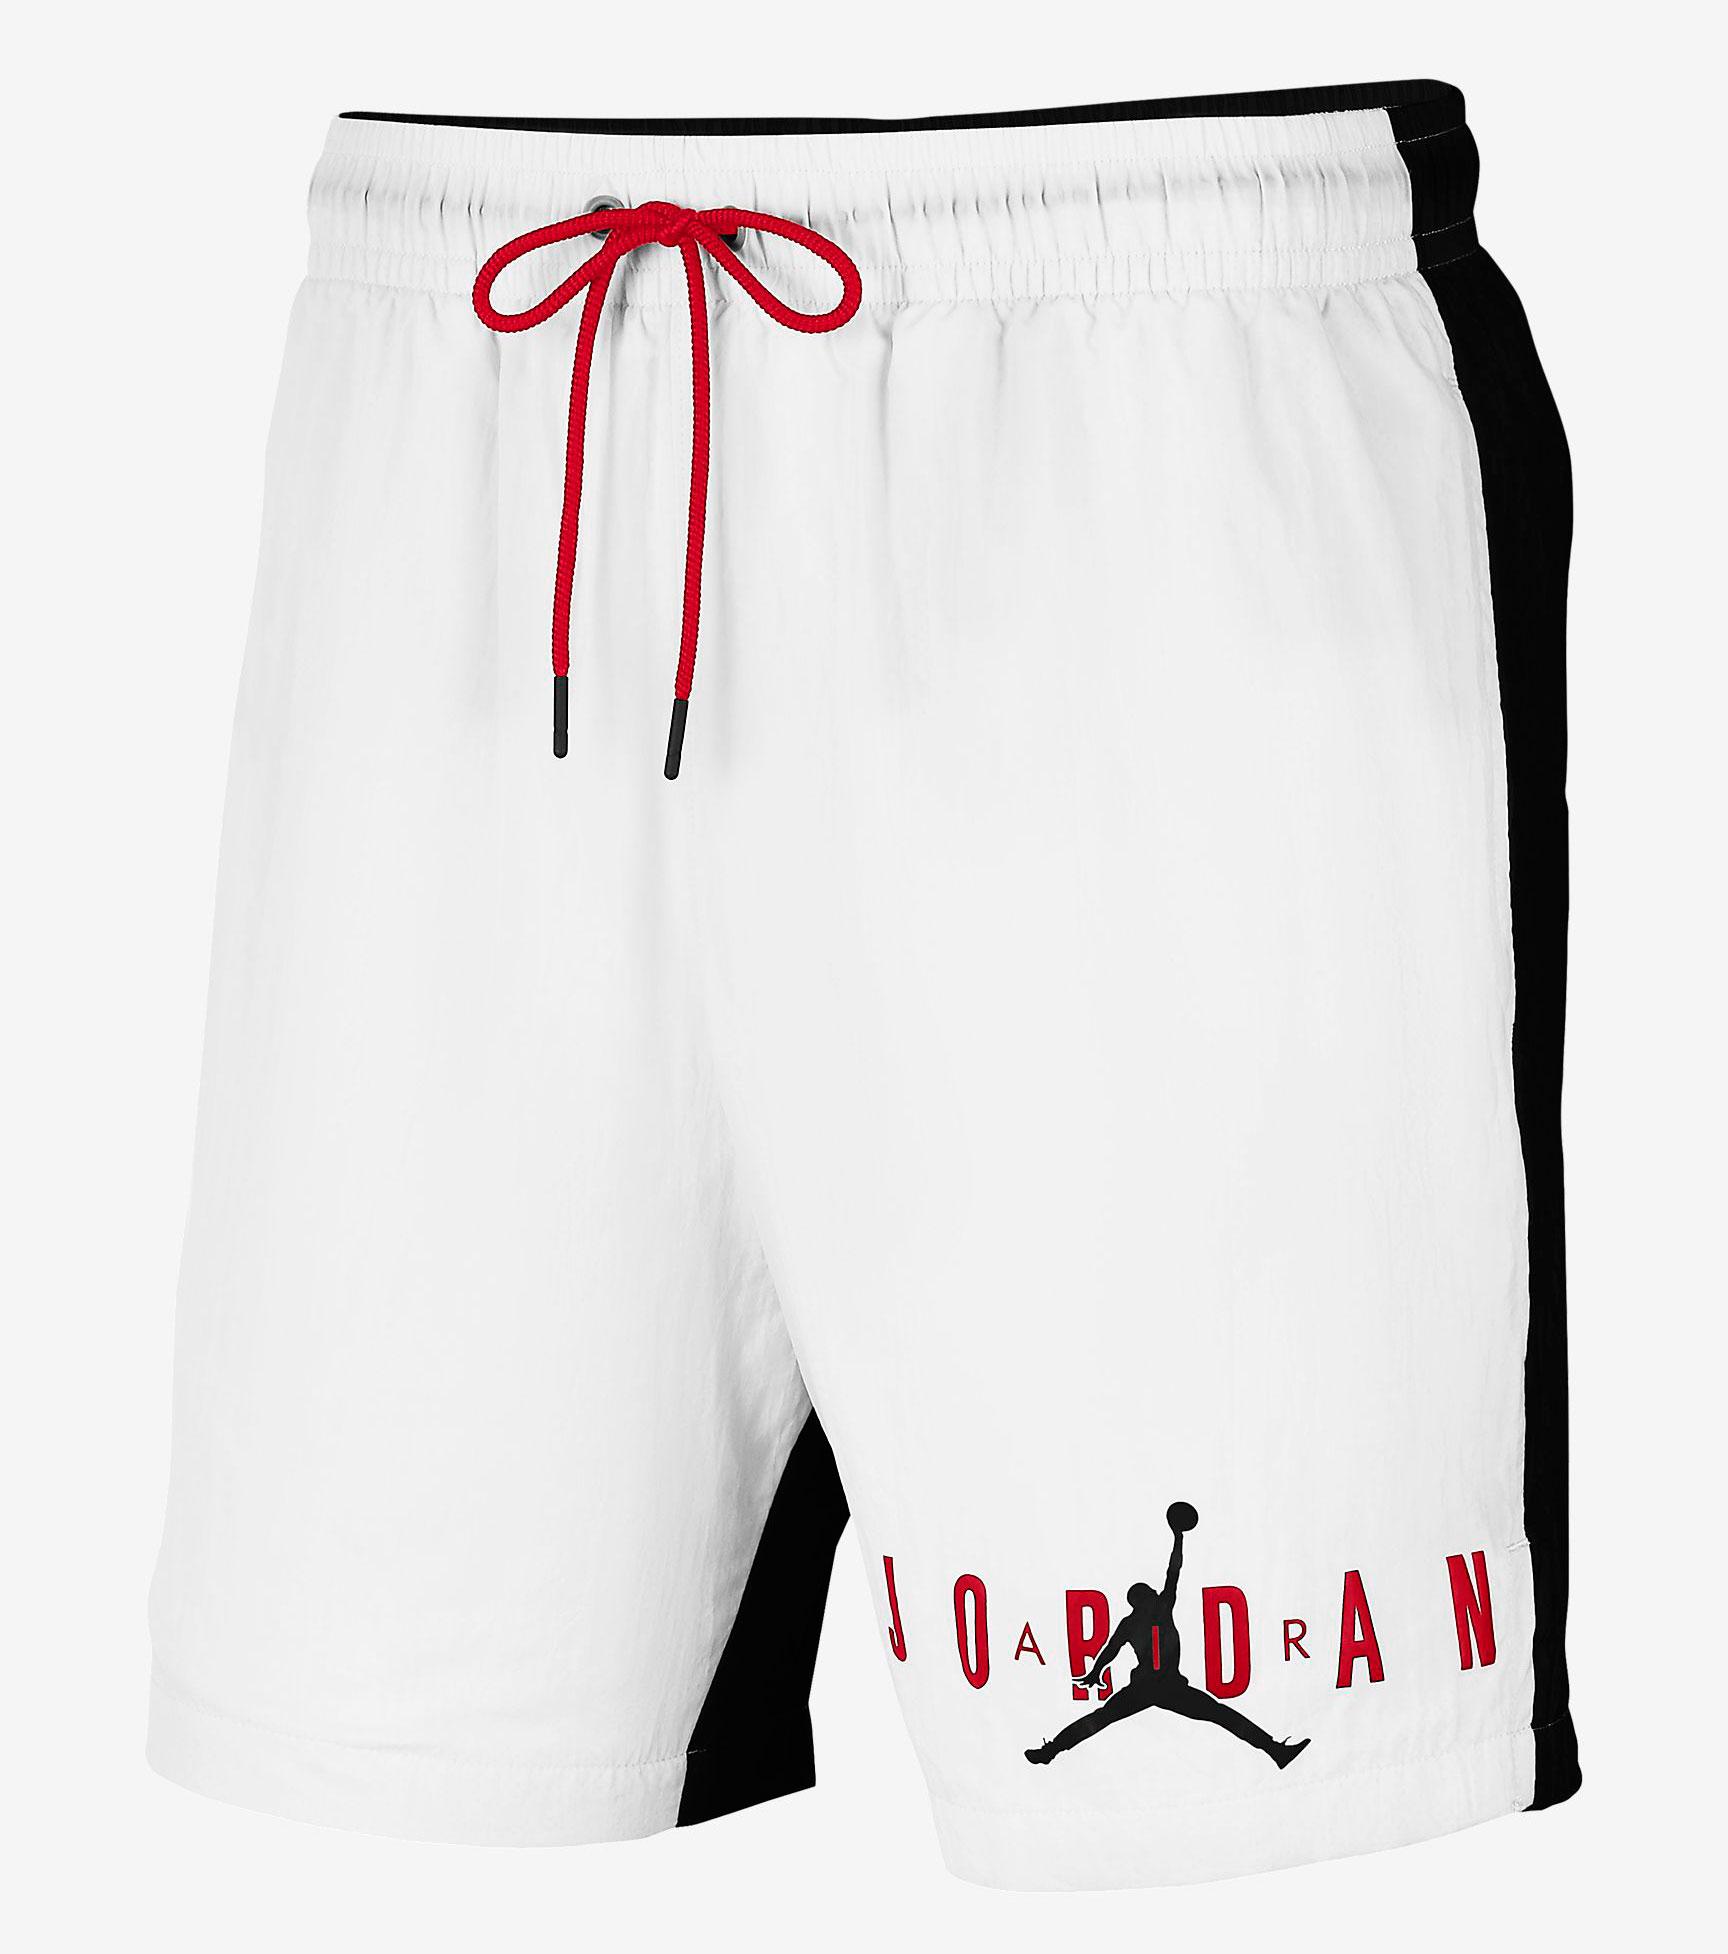 air-jordan-4-metallic-red-short-match